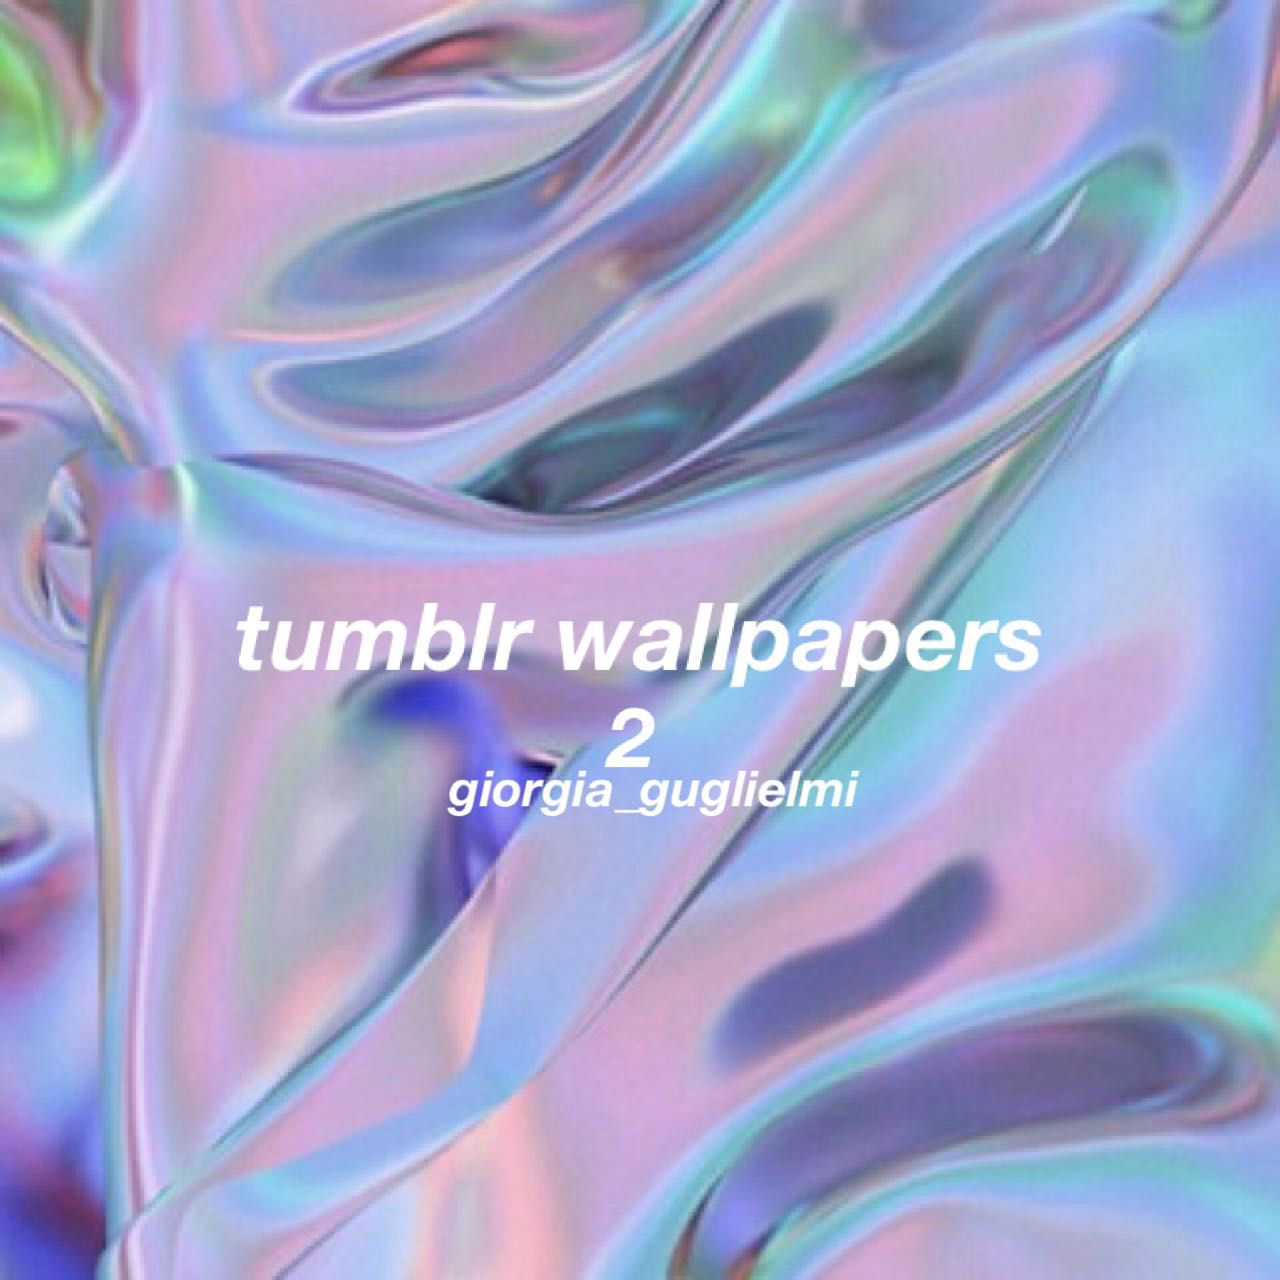 tumblr wallpapers 2 - 1 - wattpad